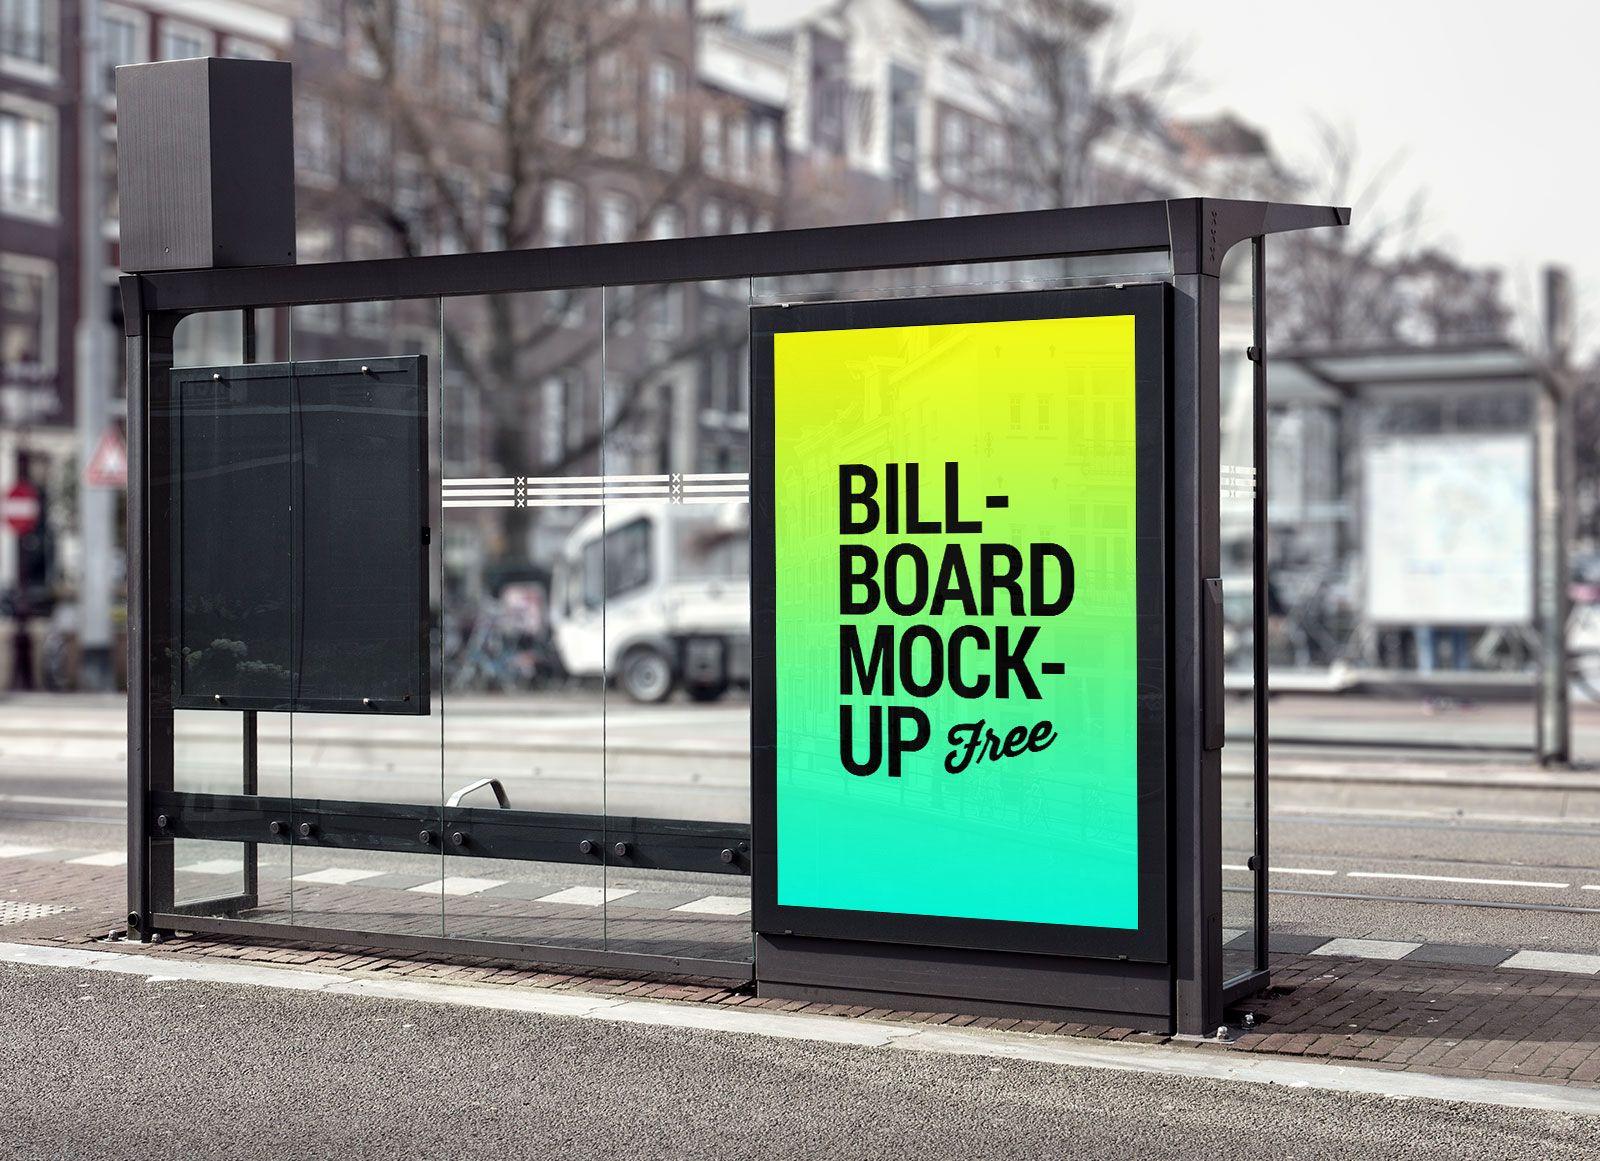 Free Bus Shelter Roadside Billboard Mockup Psd File Billboard Mockup Bus Stop Billboard